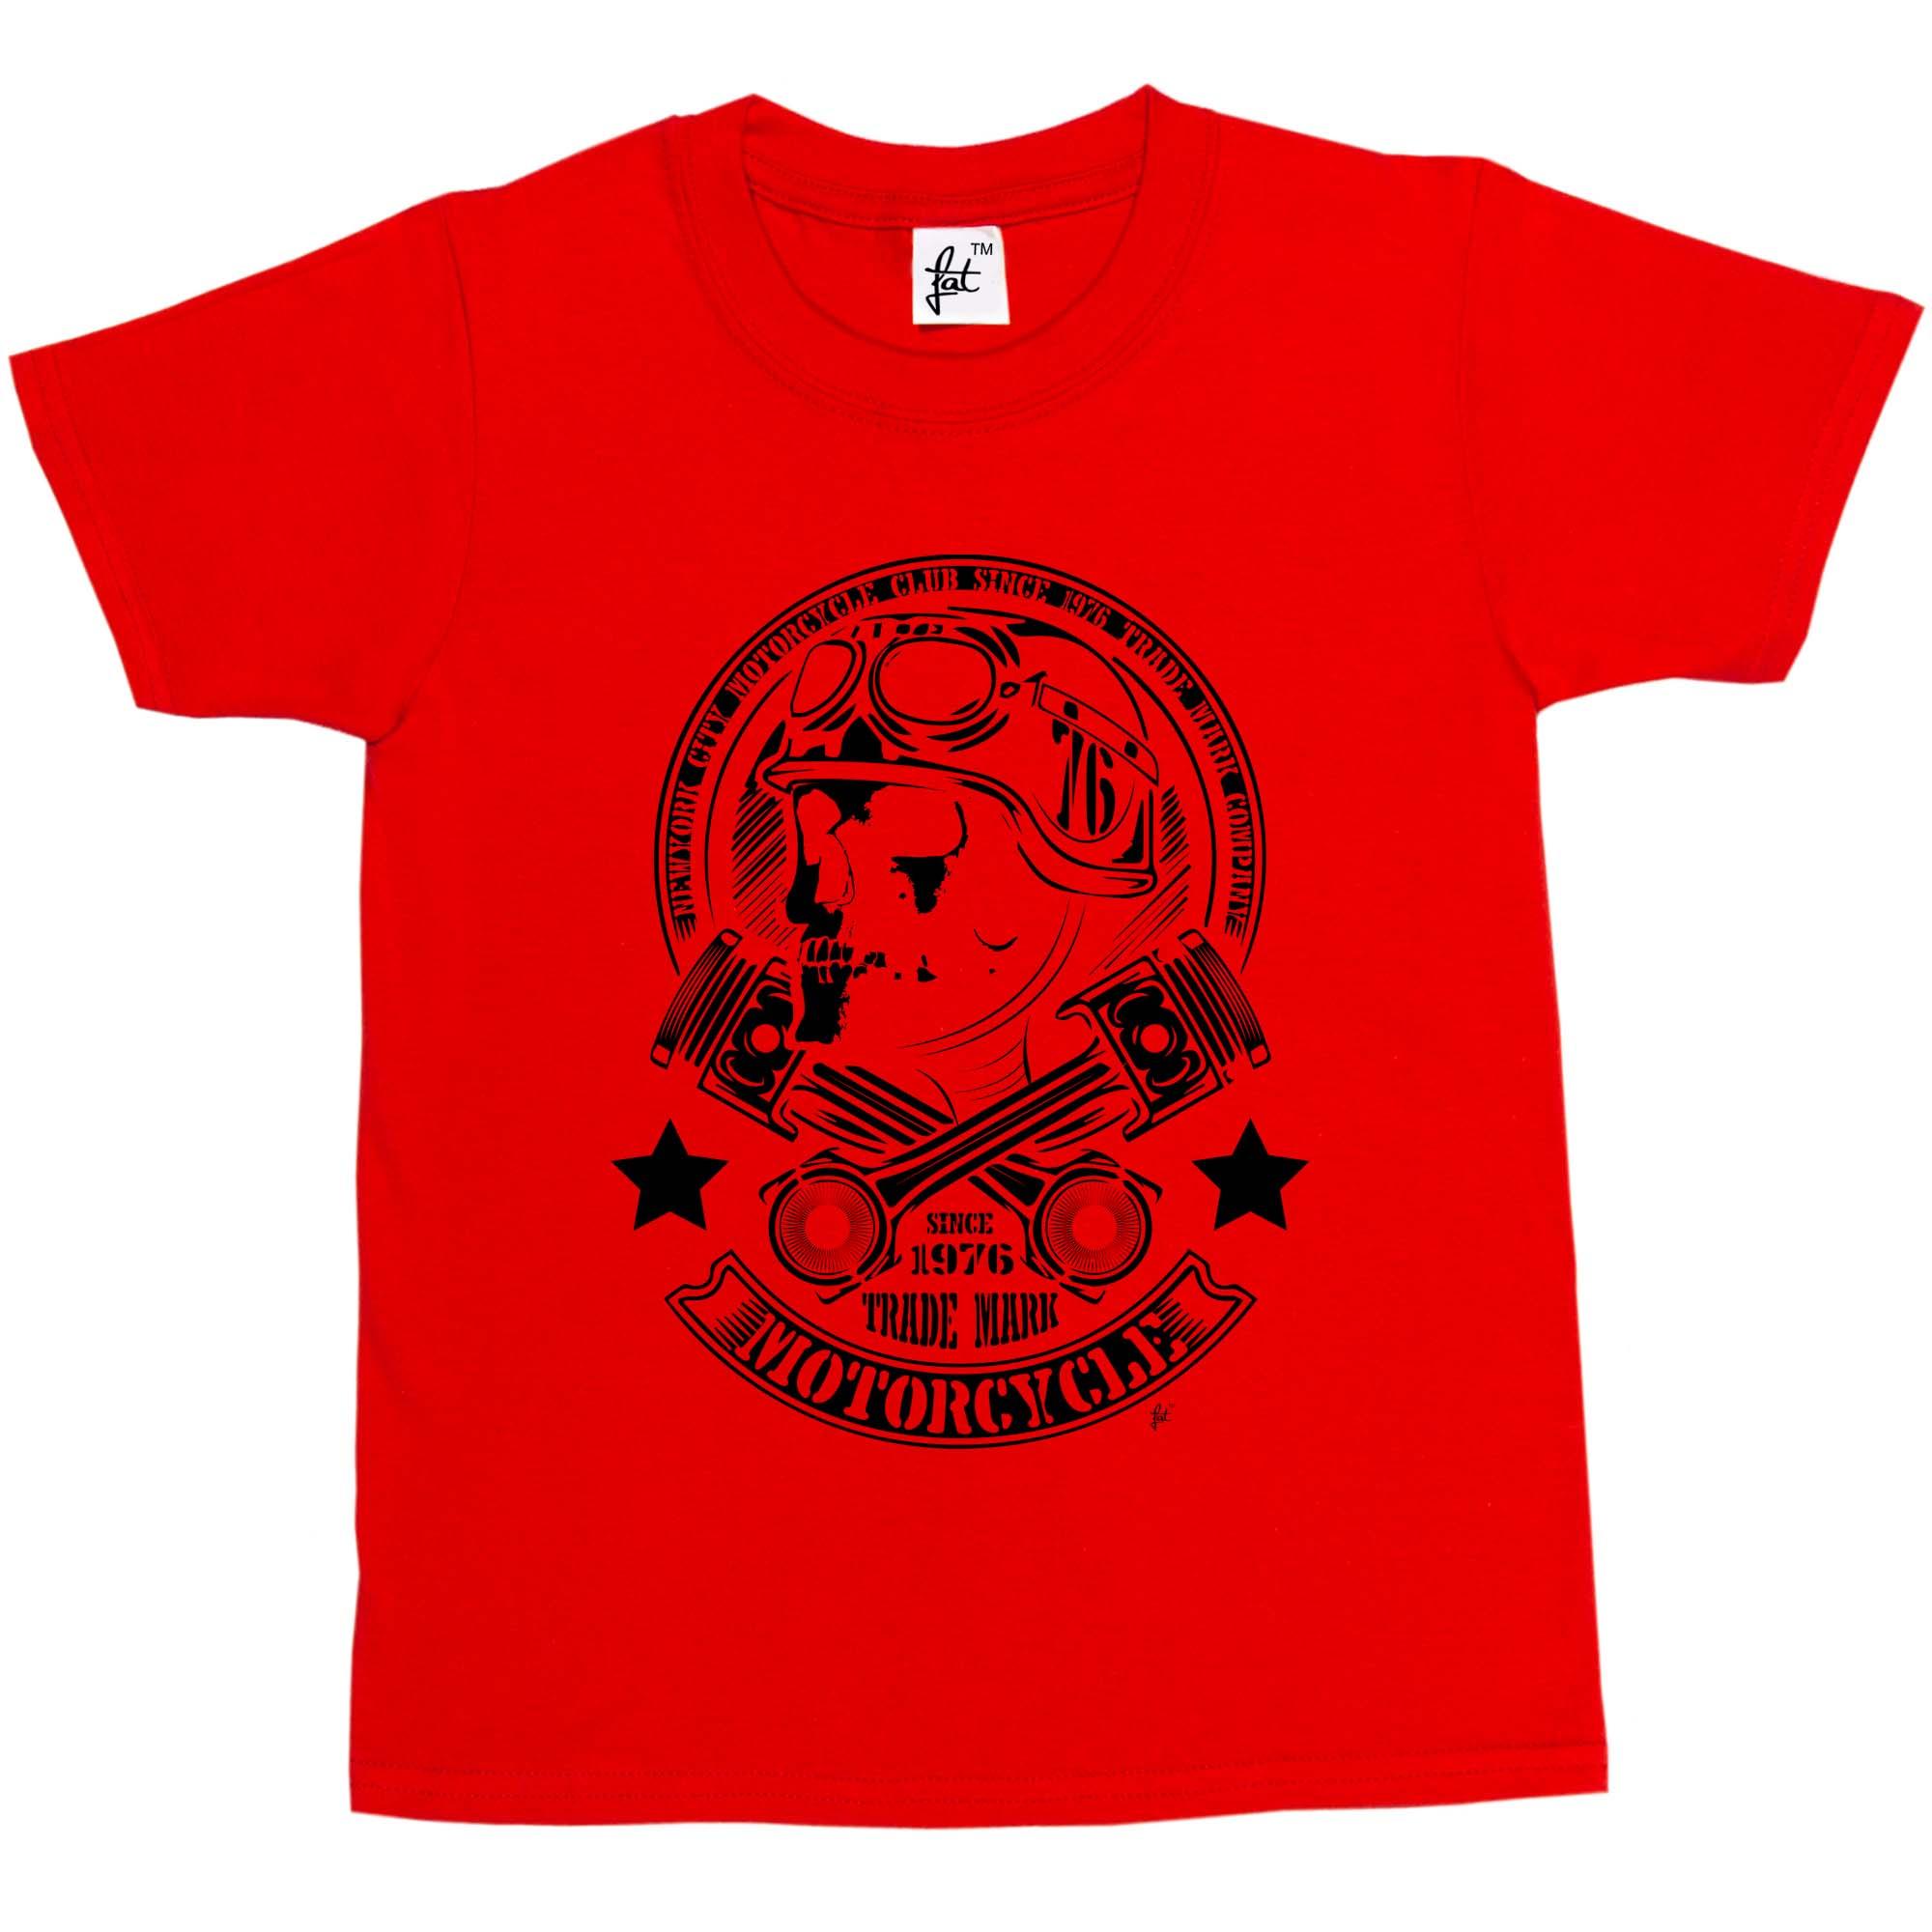 Girls T-Shirt New York City Motorcycle Club Skull Rider Cross Parts Kids Boys